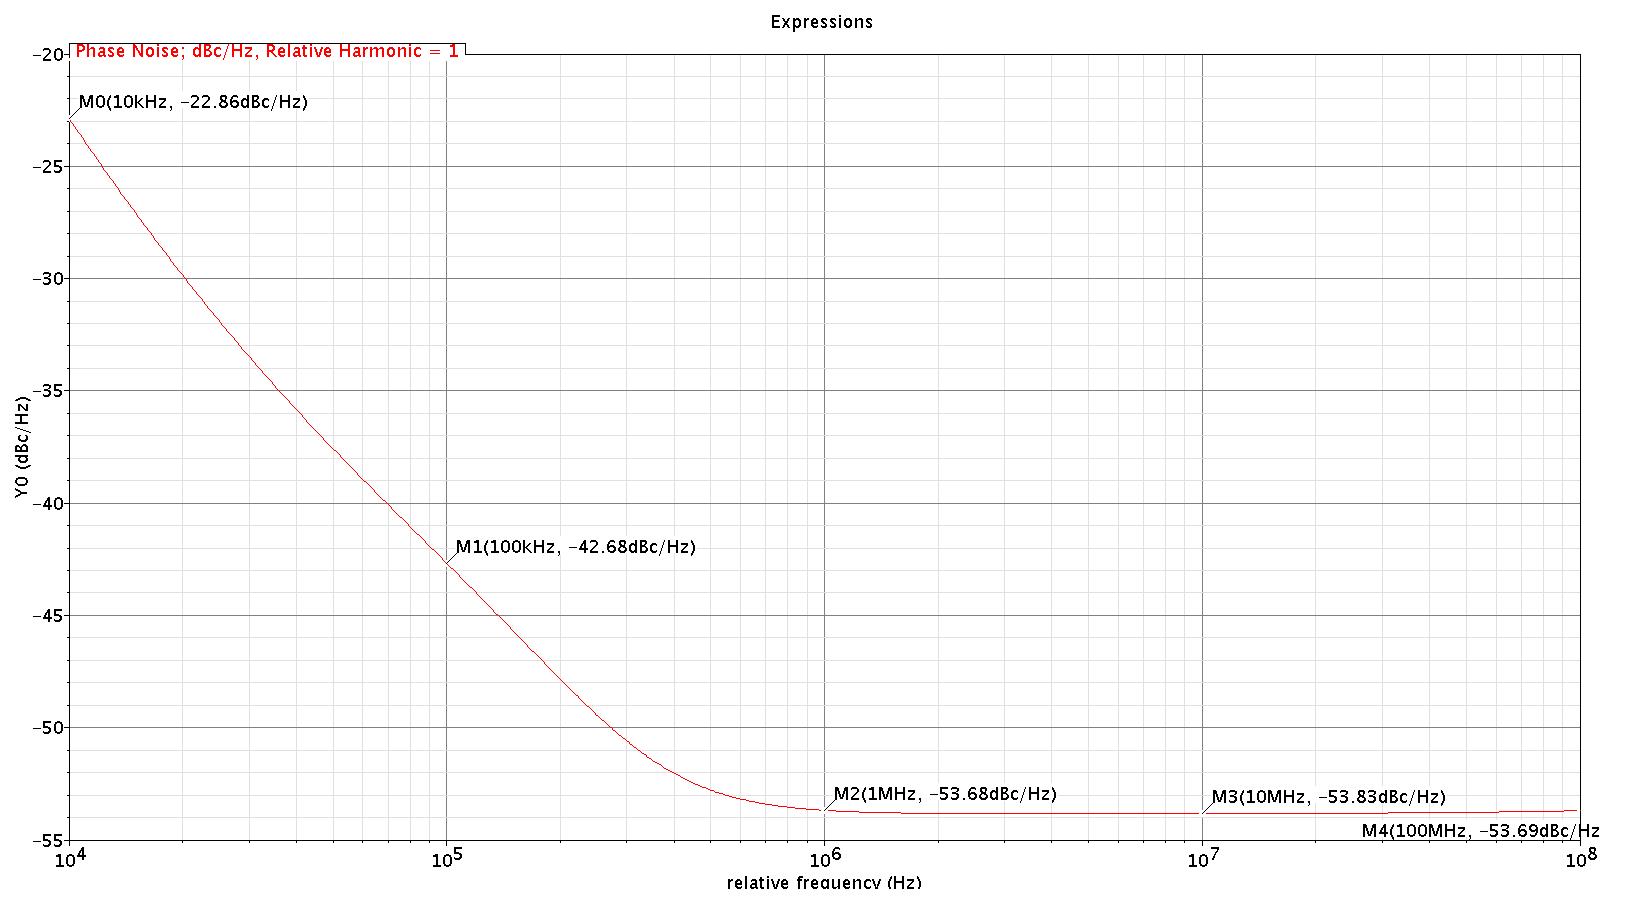 PHasenoise_clk_3_1G_-42dBc.png